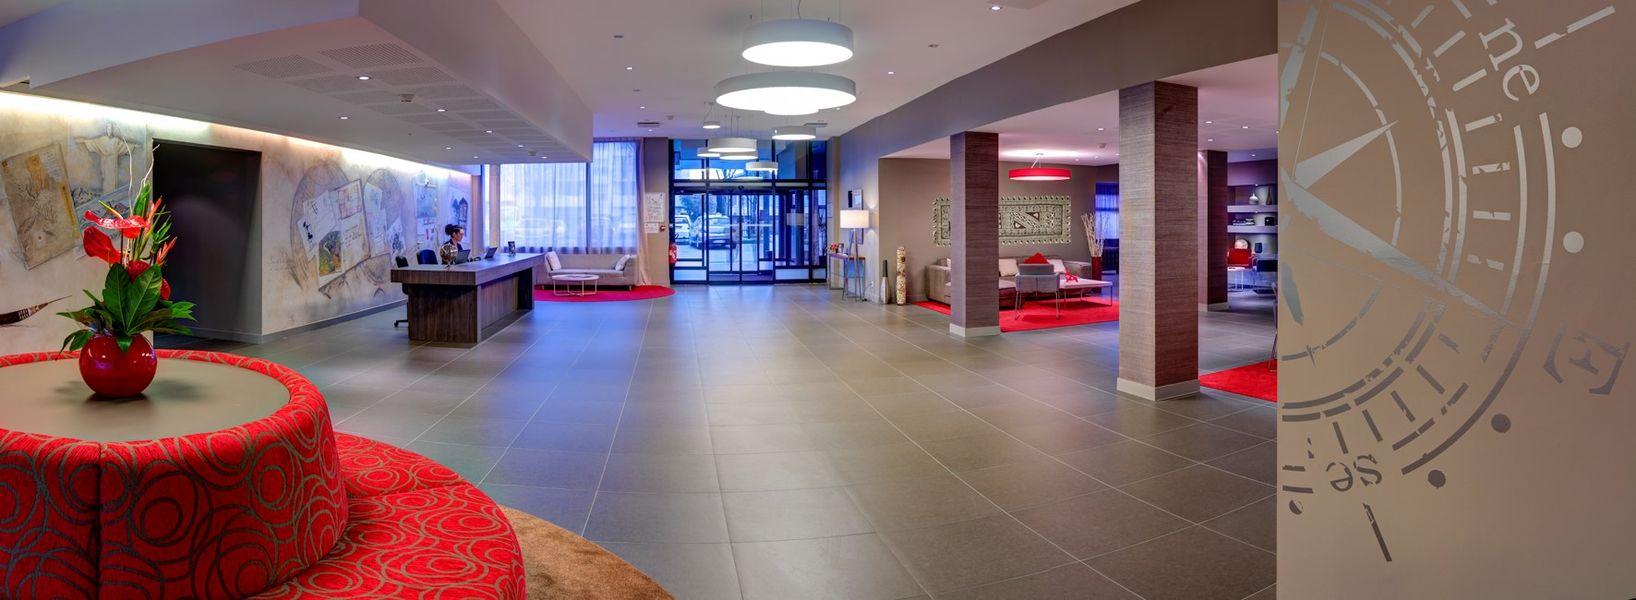 Best Western Plus Hotel de Chassieu - Lobby